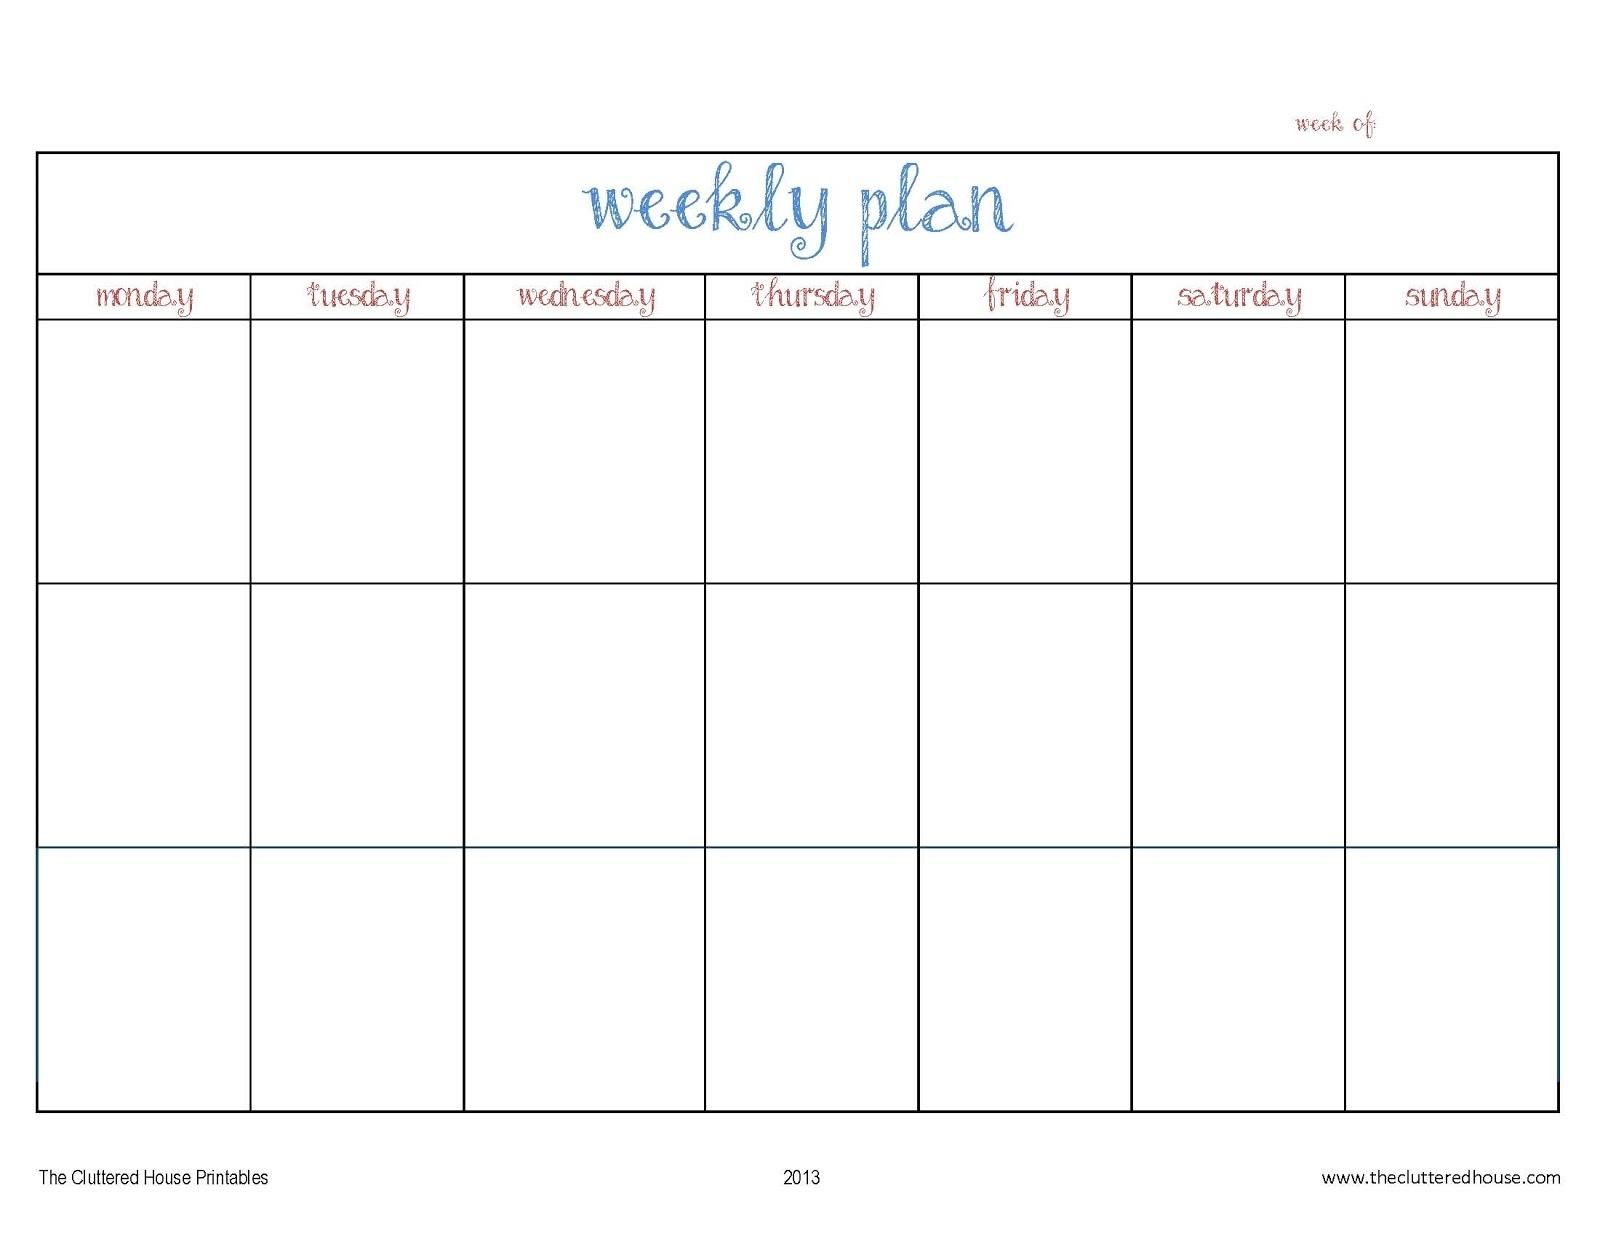 The Cluttered House: Weekly Planner Printable 3 Week Calendar Template